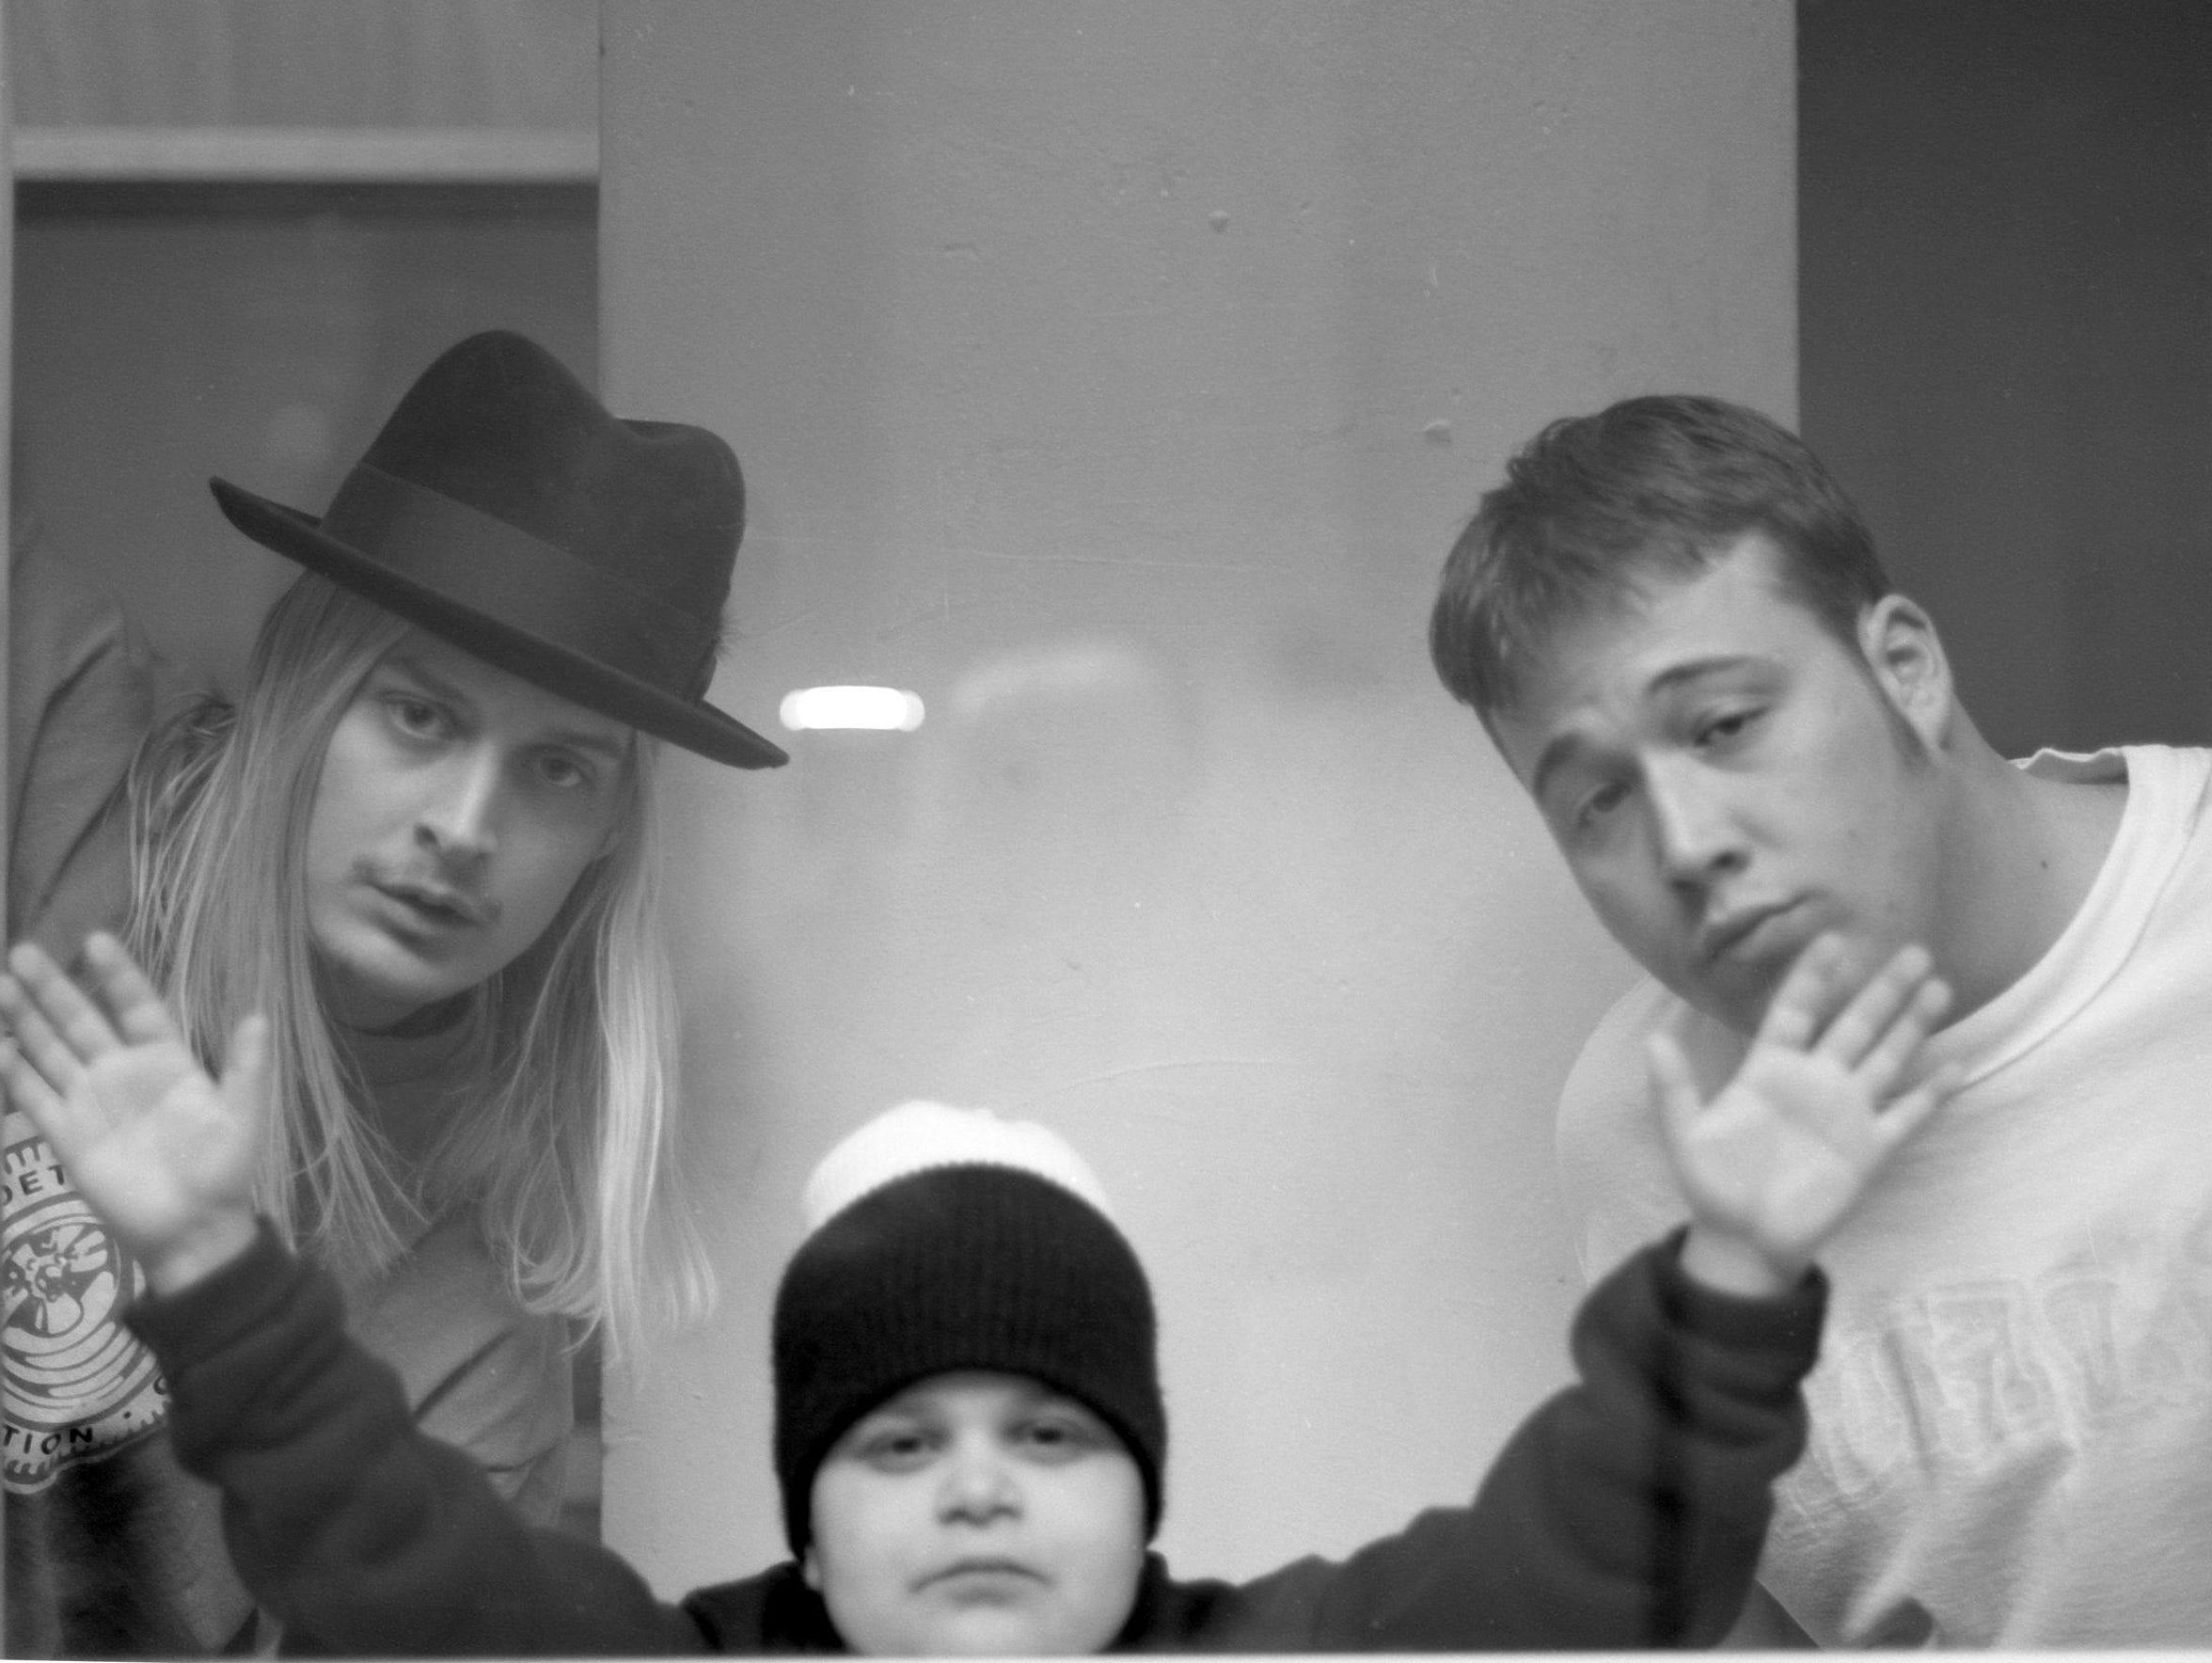 Kid Rock, Joe C and Uncle Kracker do some late-night